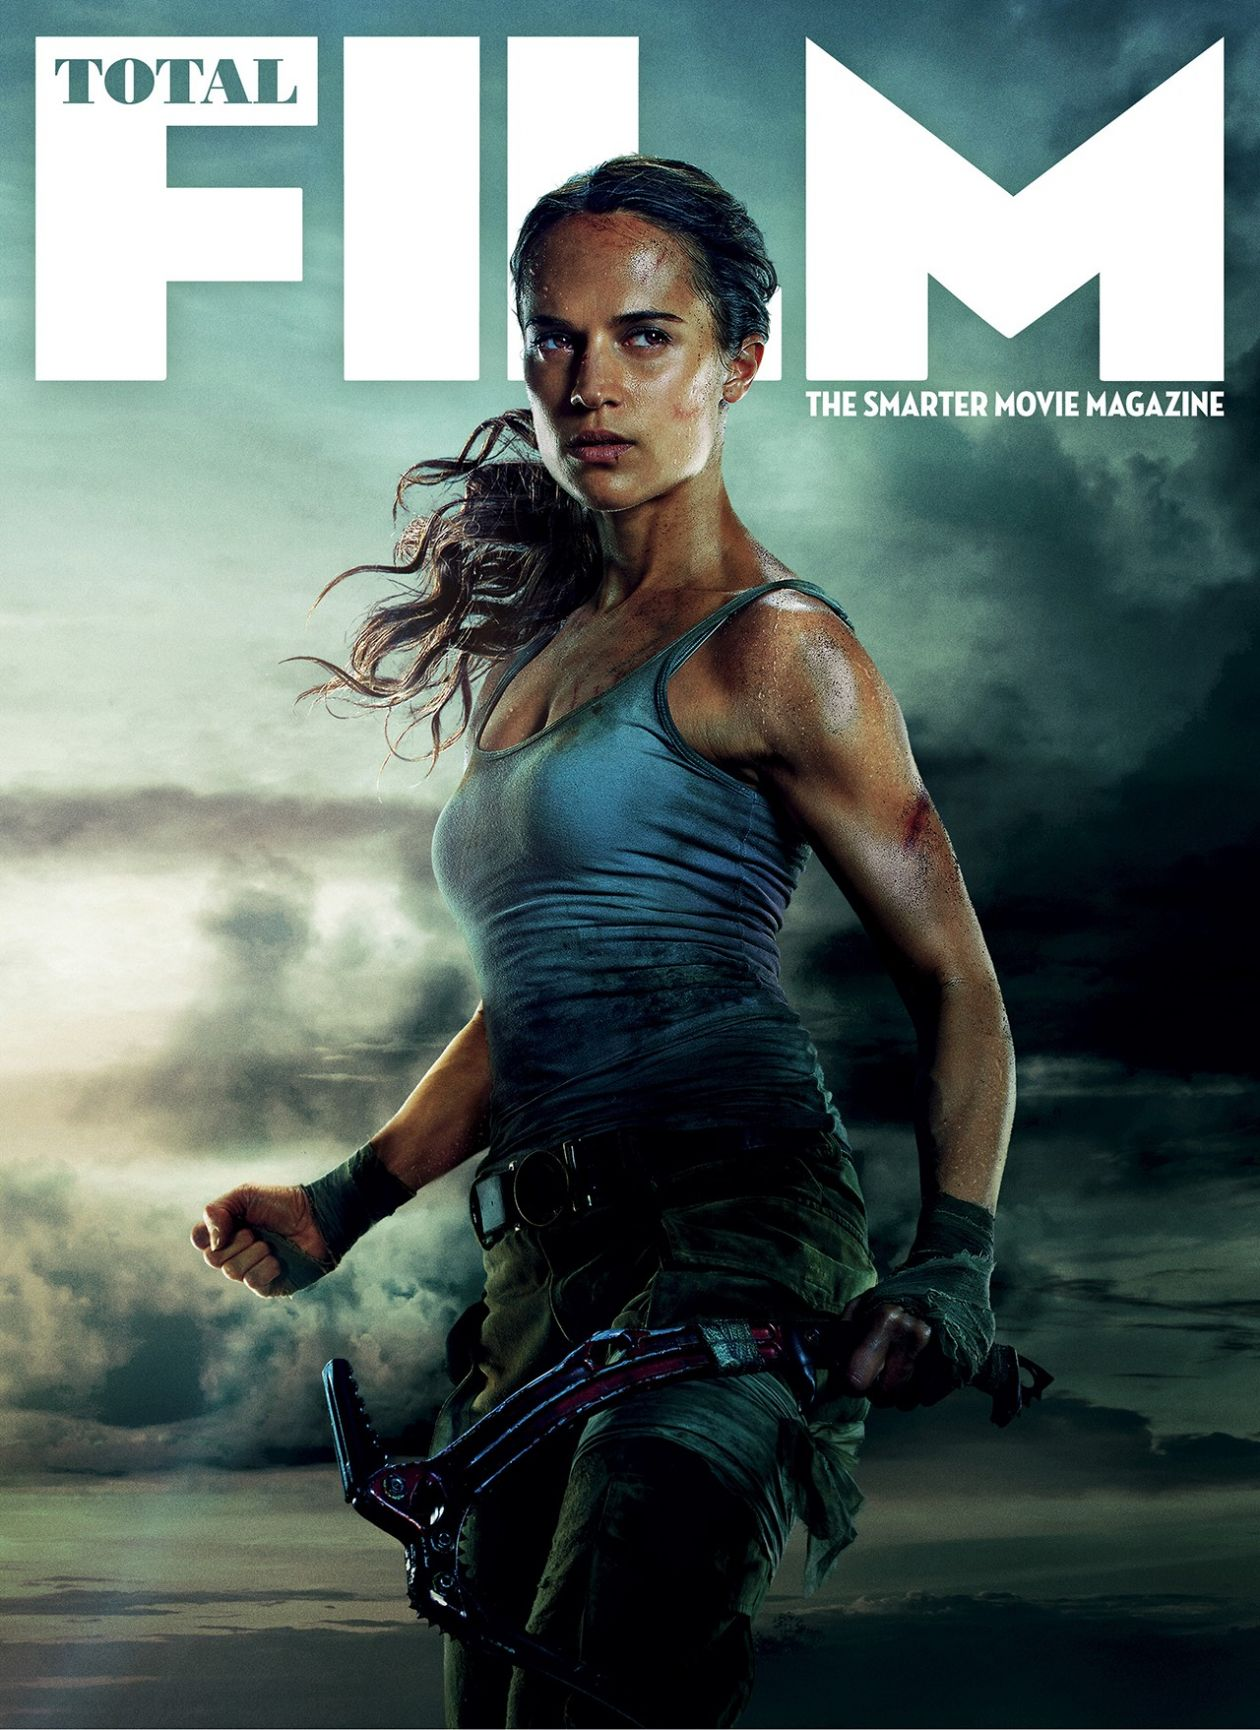 Alicia Vikander actress | Lara Croft | Tomb Raider 2018 | Total Film Magazine Cover / Poster